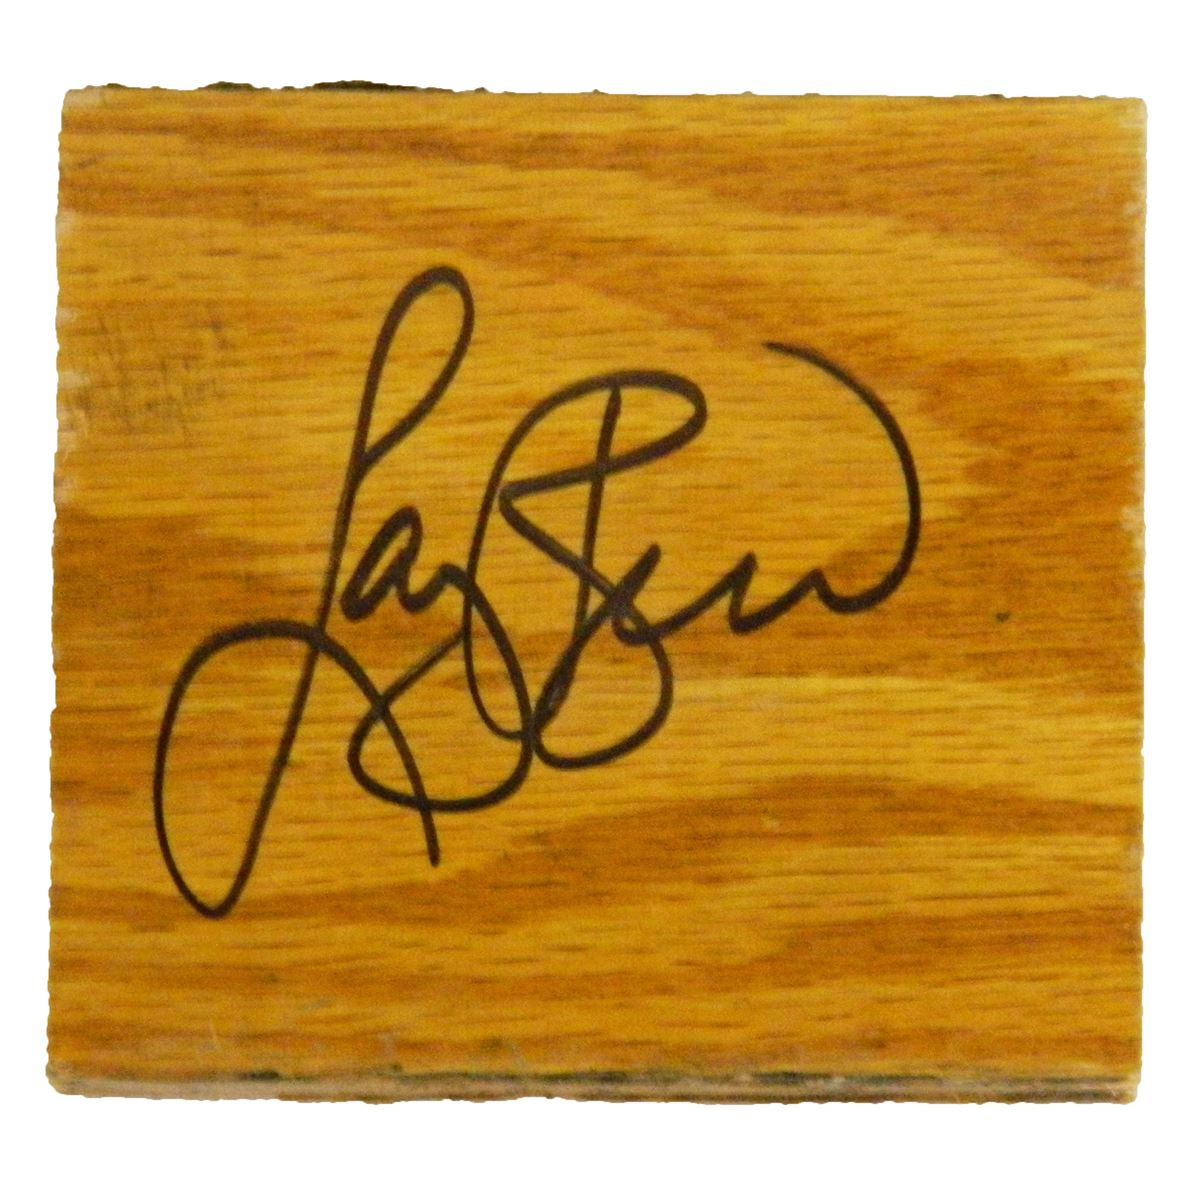 Larry Bird Signed Celtics Boston Garden Original Parquet 4x4 Floor